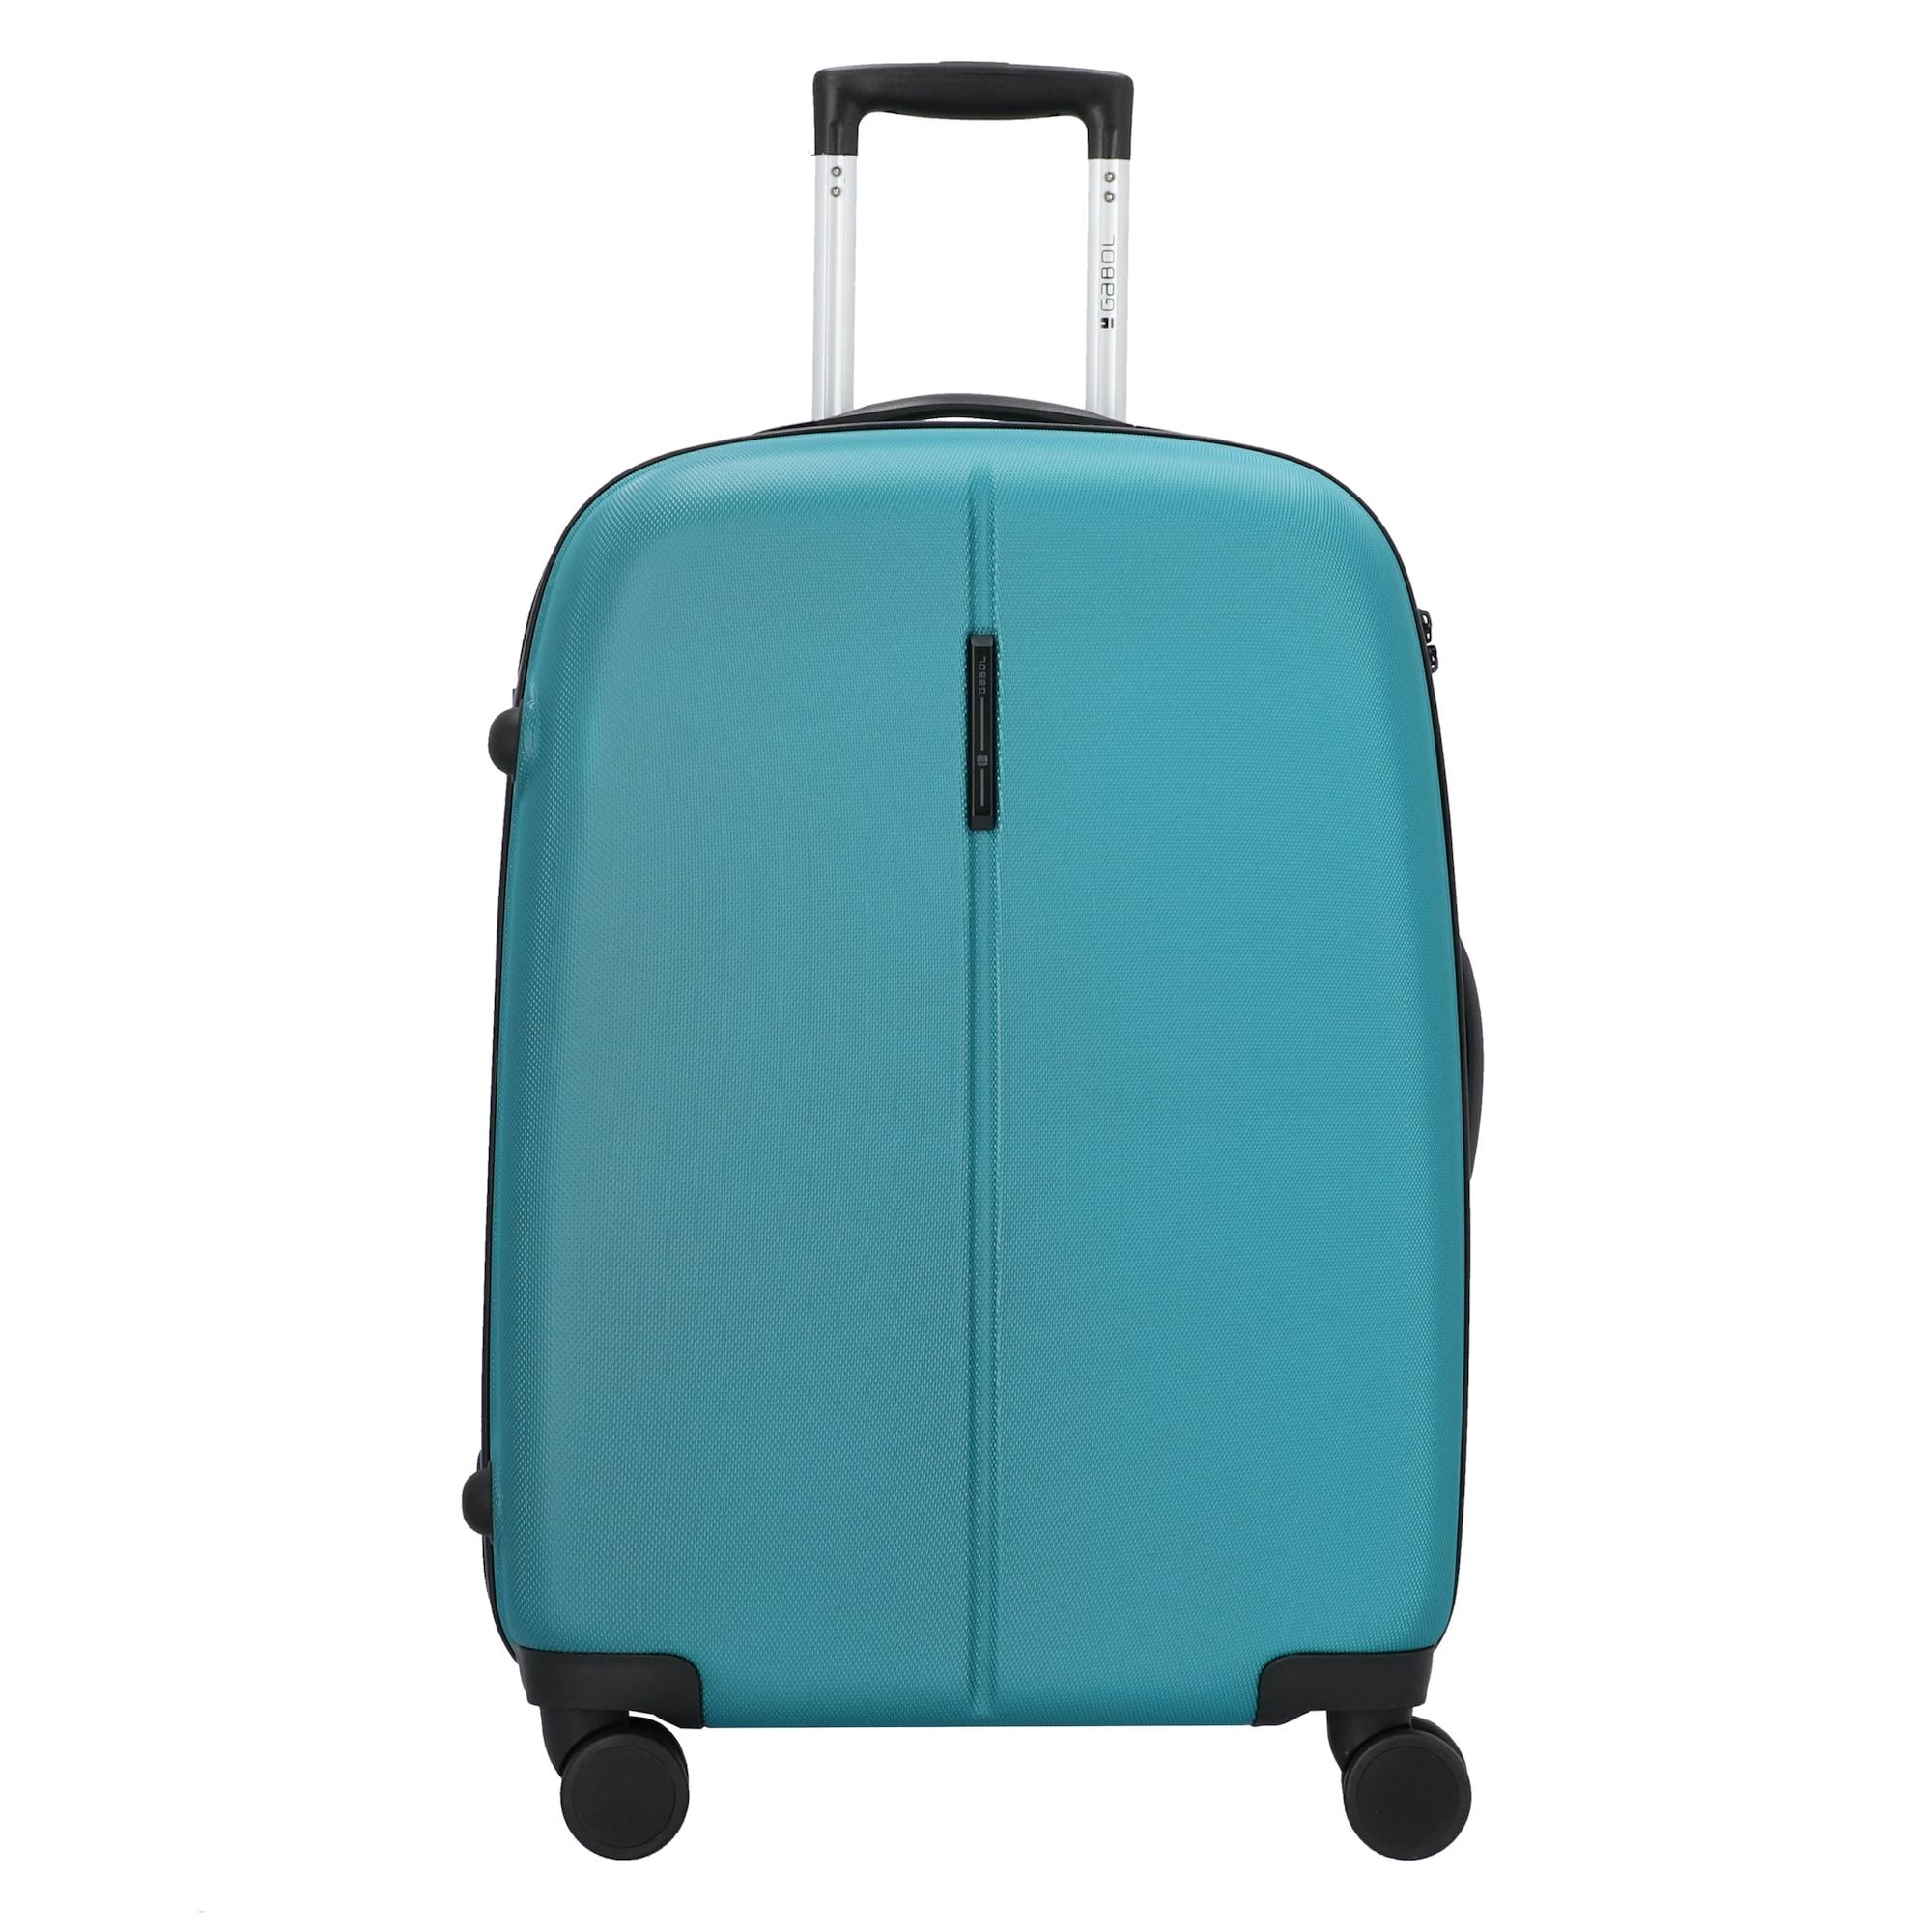 Trolley | Taschen > Koffer & Trolleys > Trolleys | Schwarz | Gabol